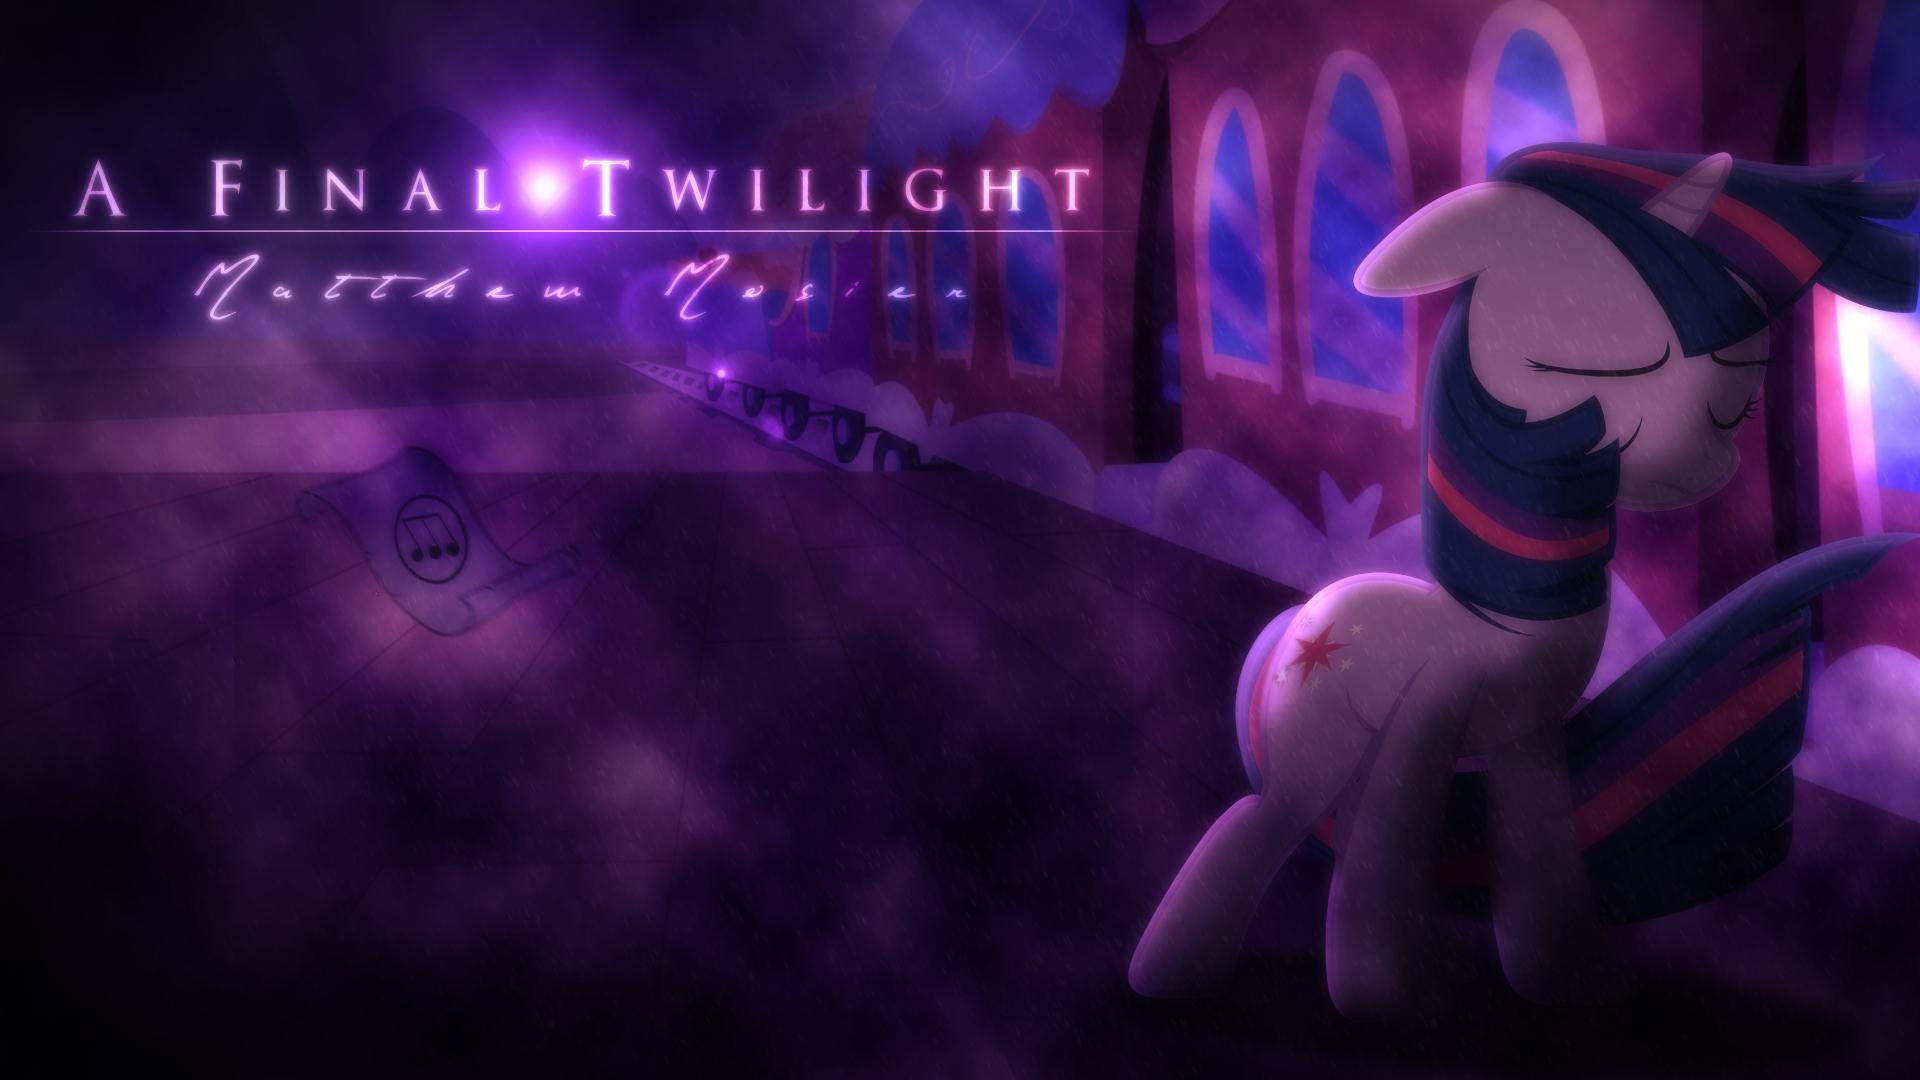 A Final Twilight- Matthew Mosier [Cover Art] by KiniestLimit, M99moron, Vexx3 and Yanoda